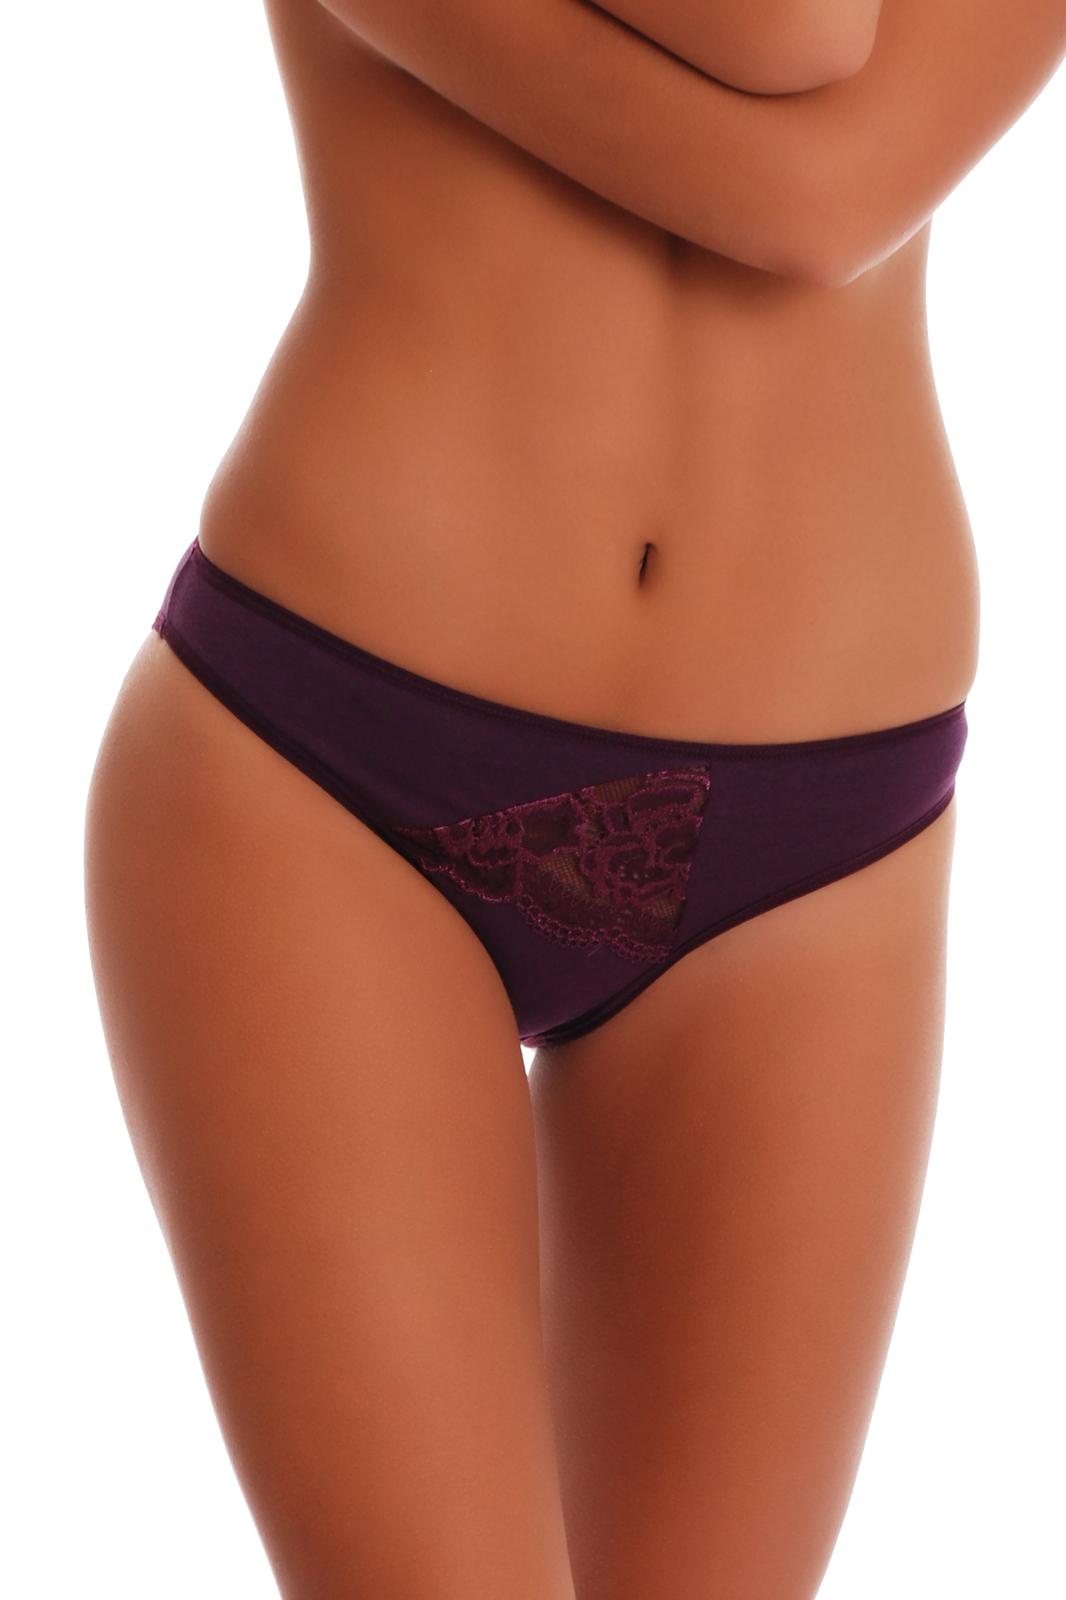 Cotton High-cut Briefs Panties with Lace M L XL 2XL 3XL Tiara Galiano 1314 EU